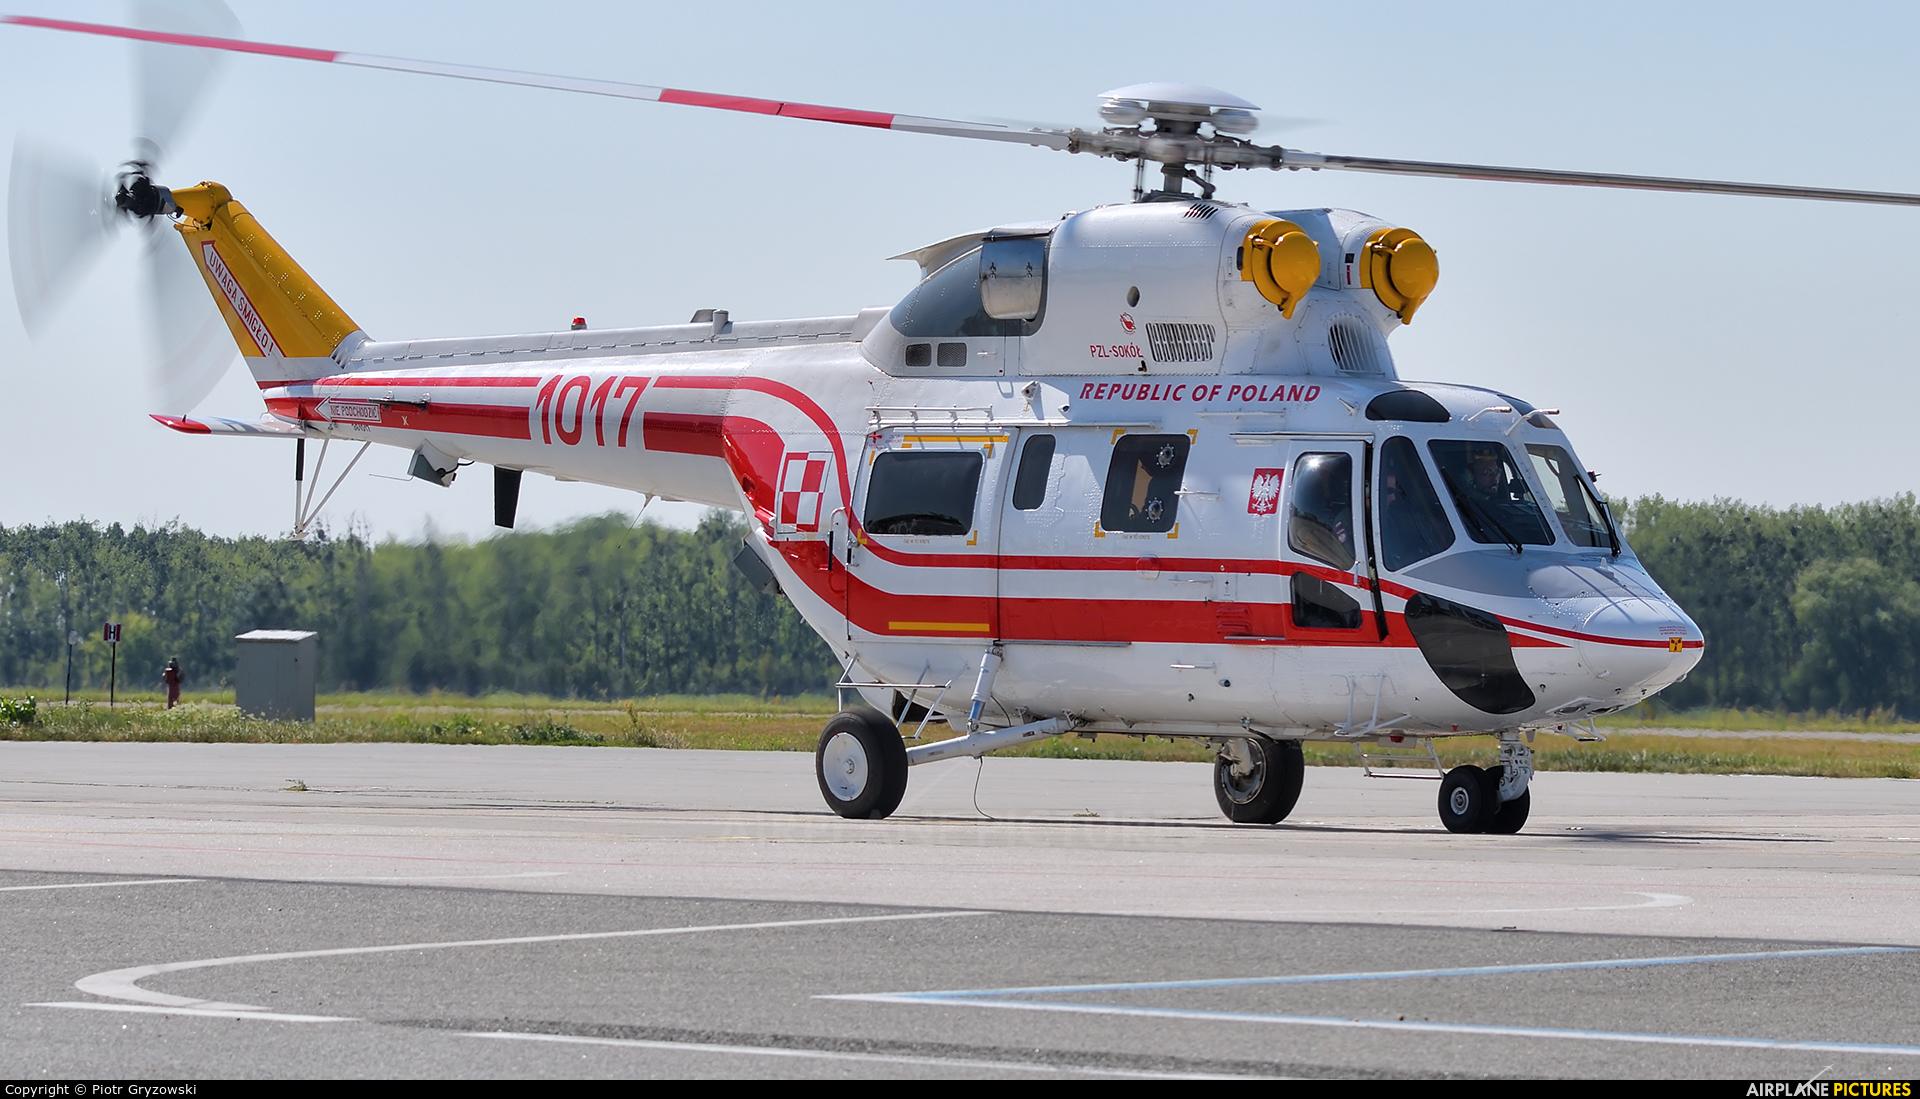 Poland - Air Force 1017 aircraft at Wrocław - Copernicus